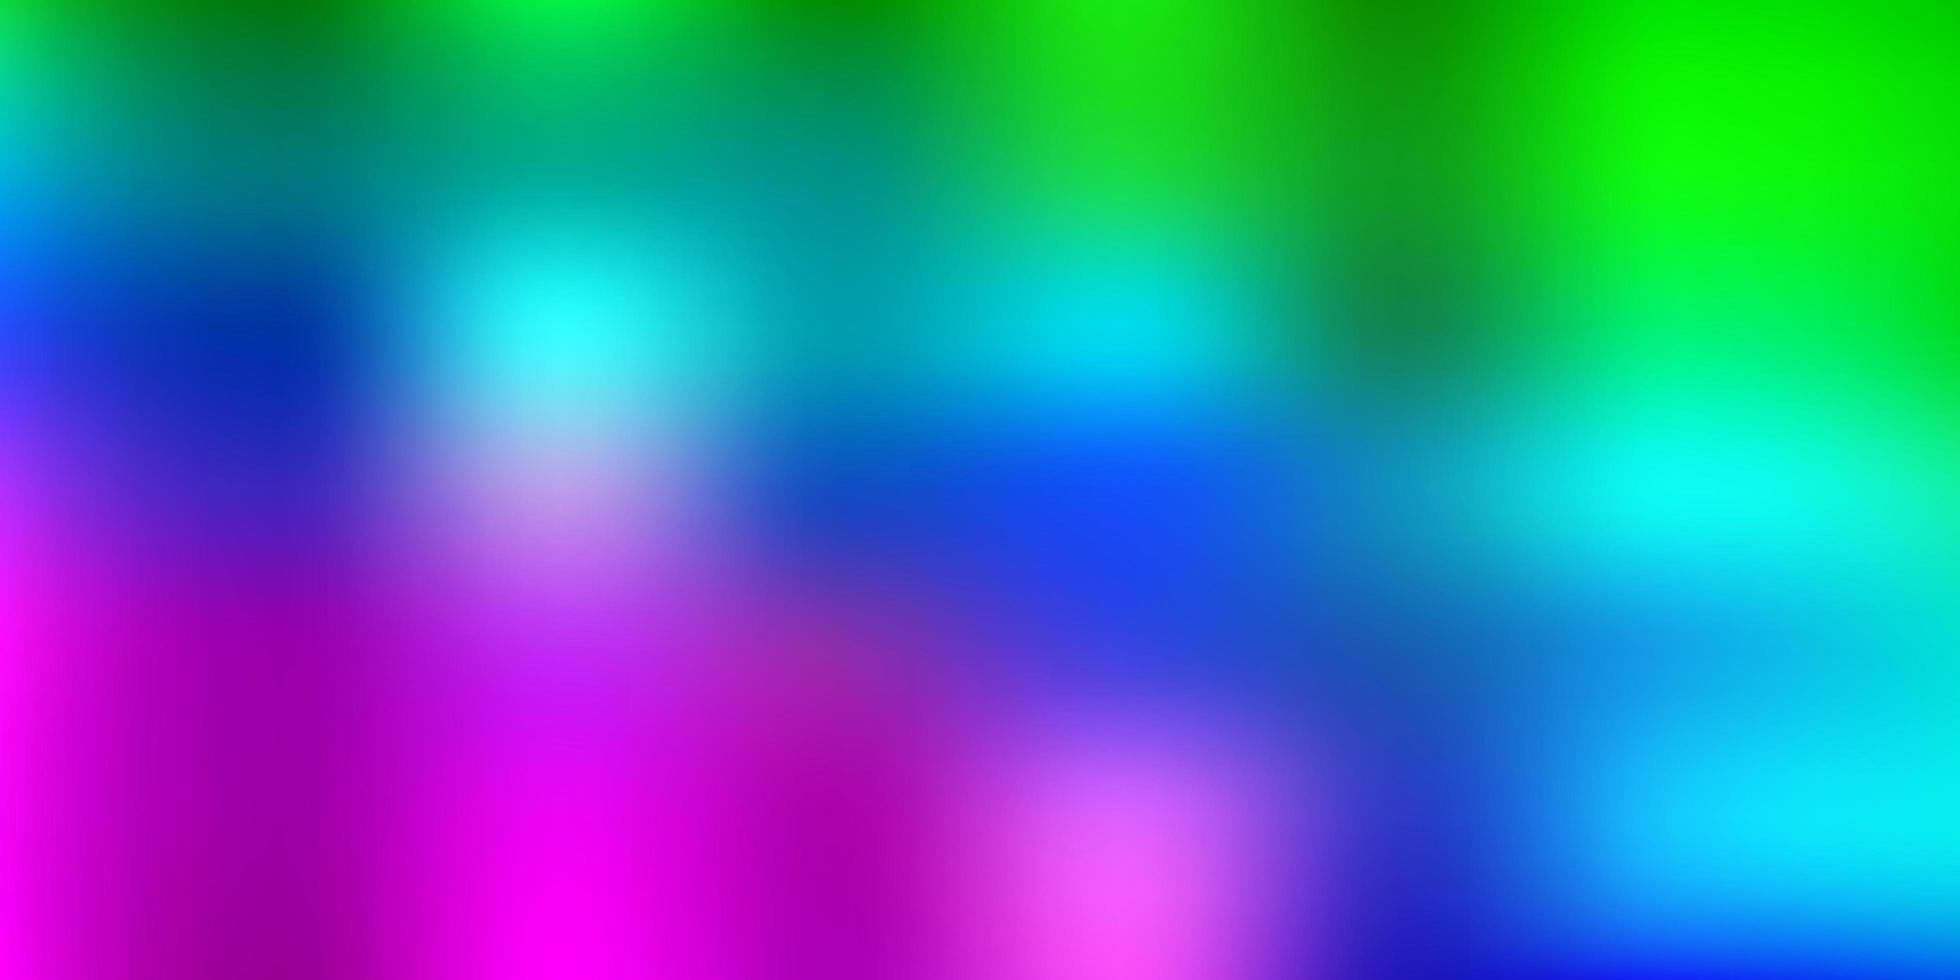 ljus flerfärgad vektor suddig mall.